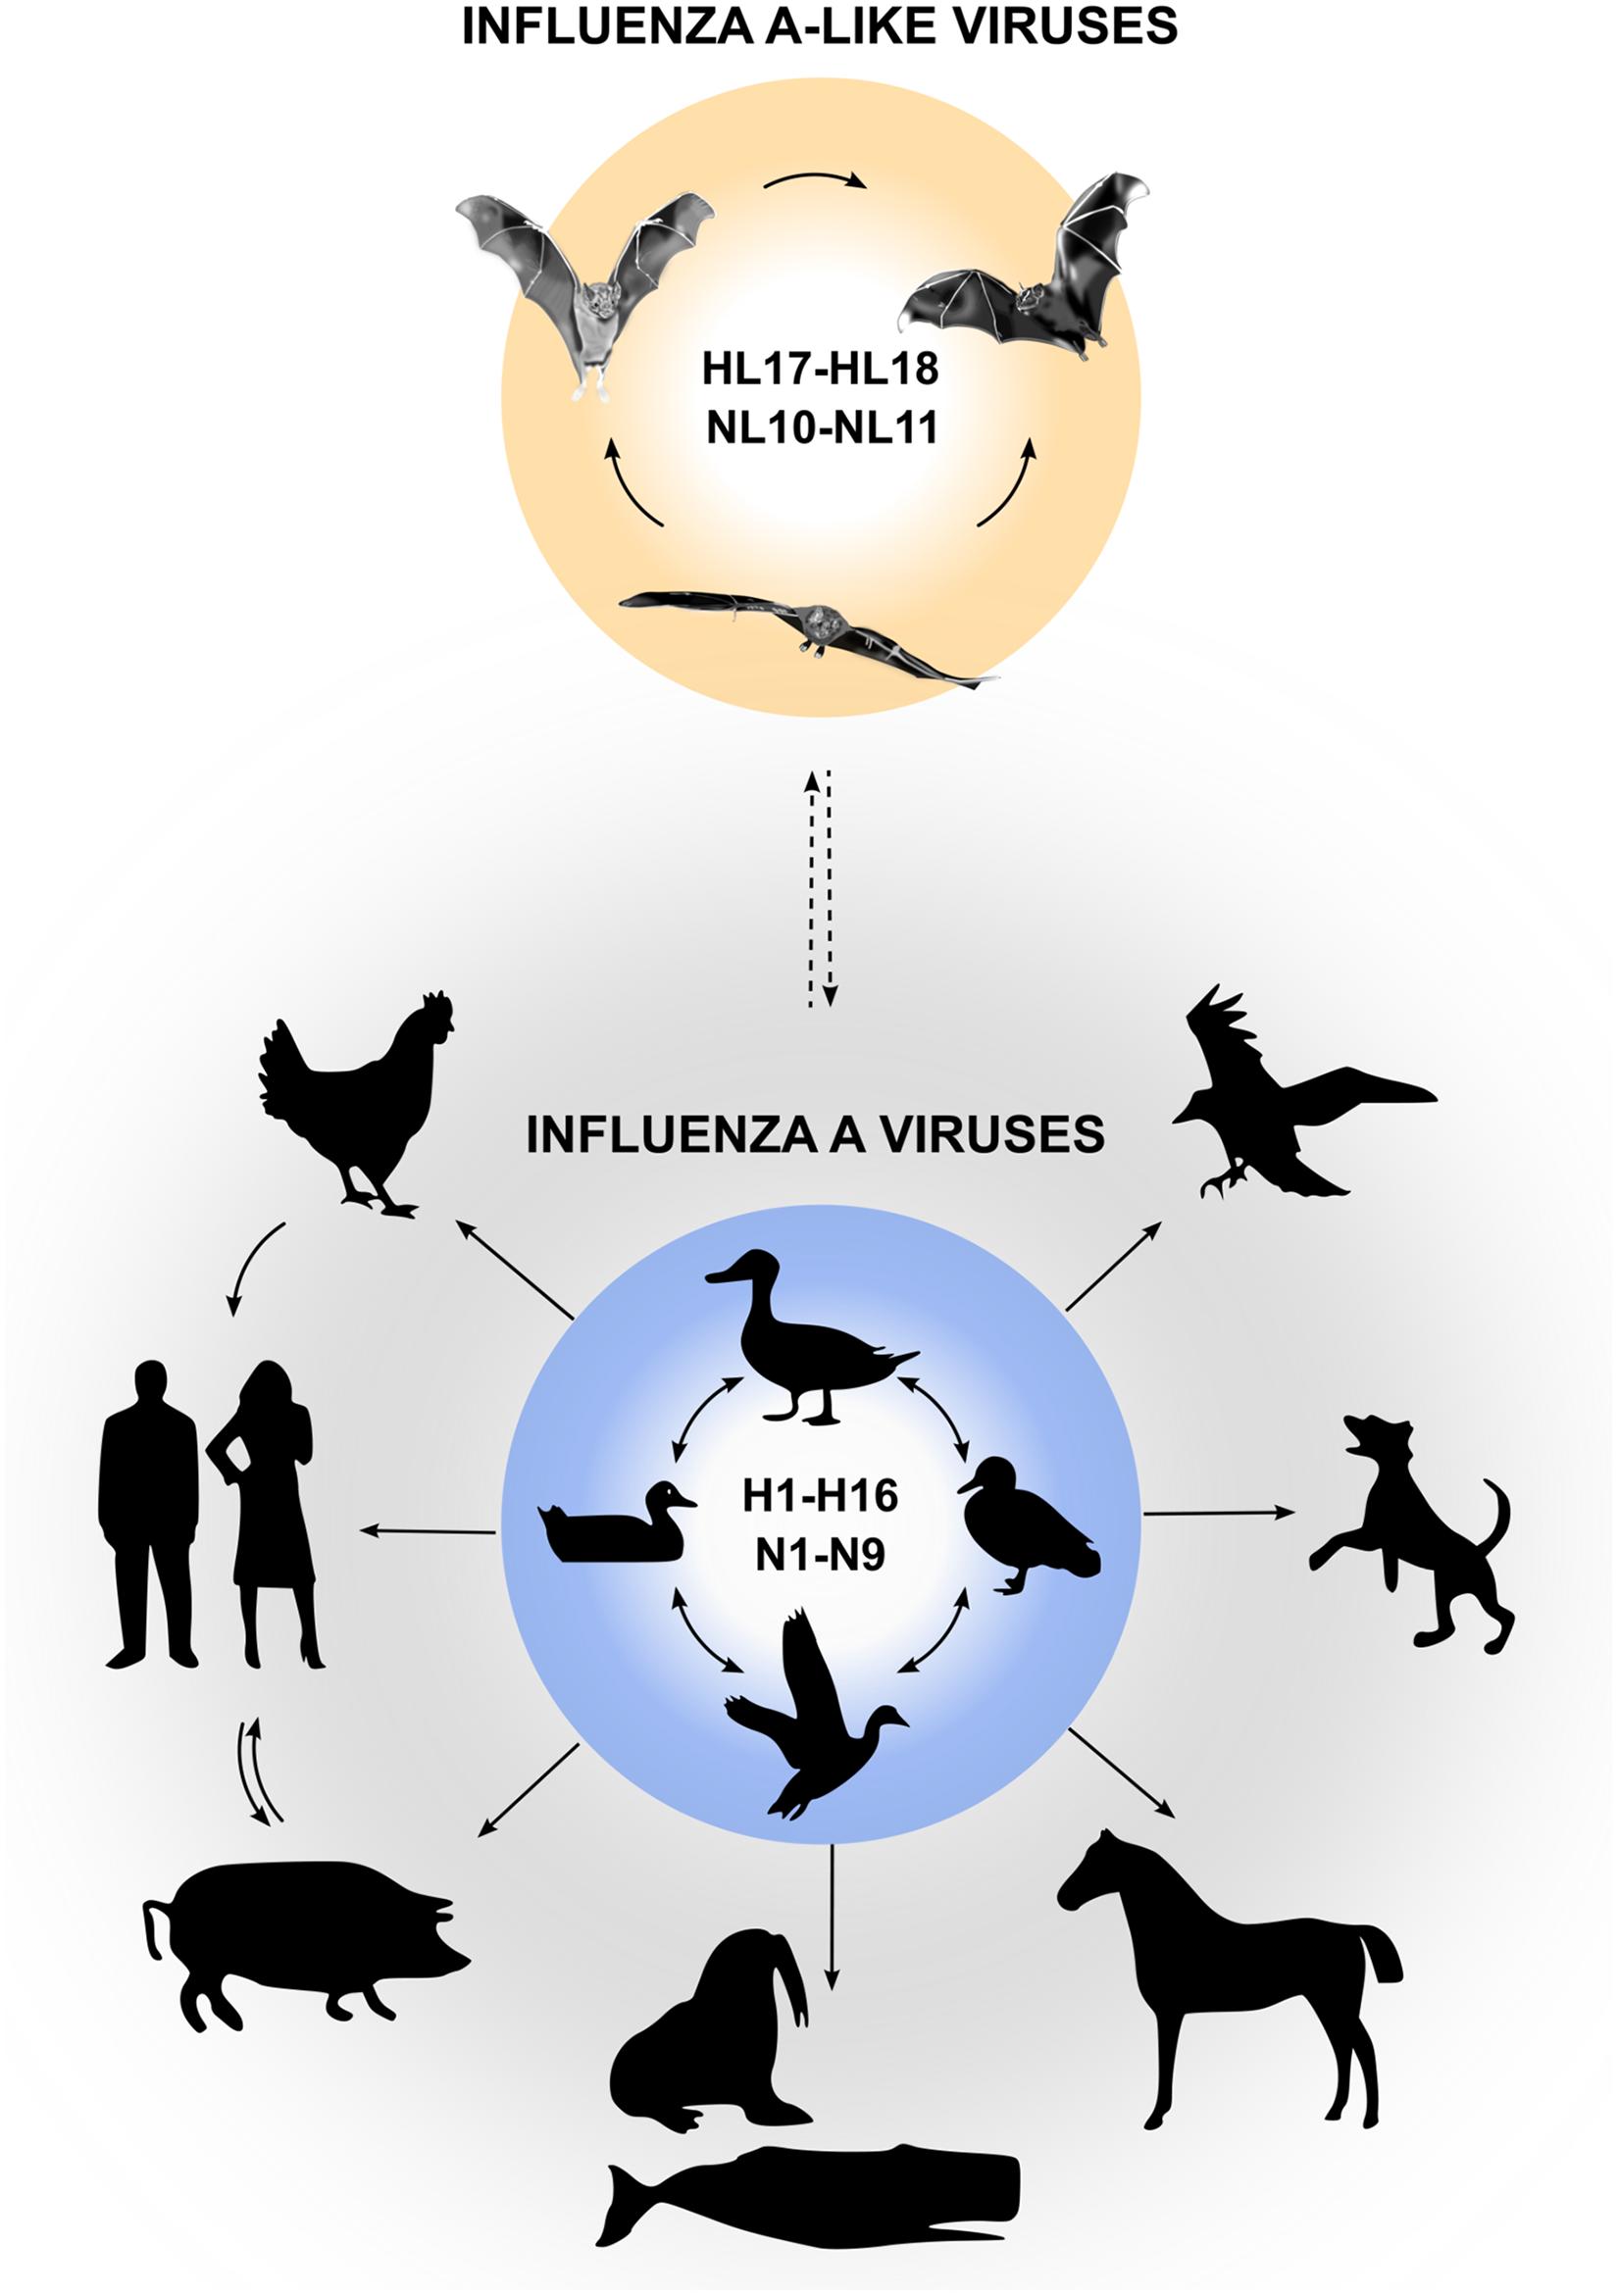 Reservoirs of IAVs and bat influenza-A-like viruses.